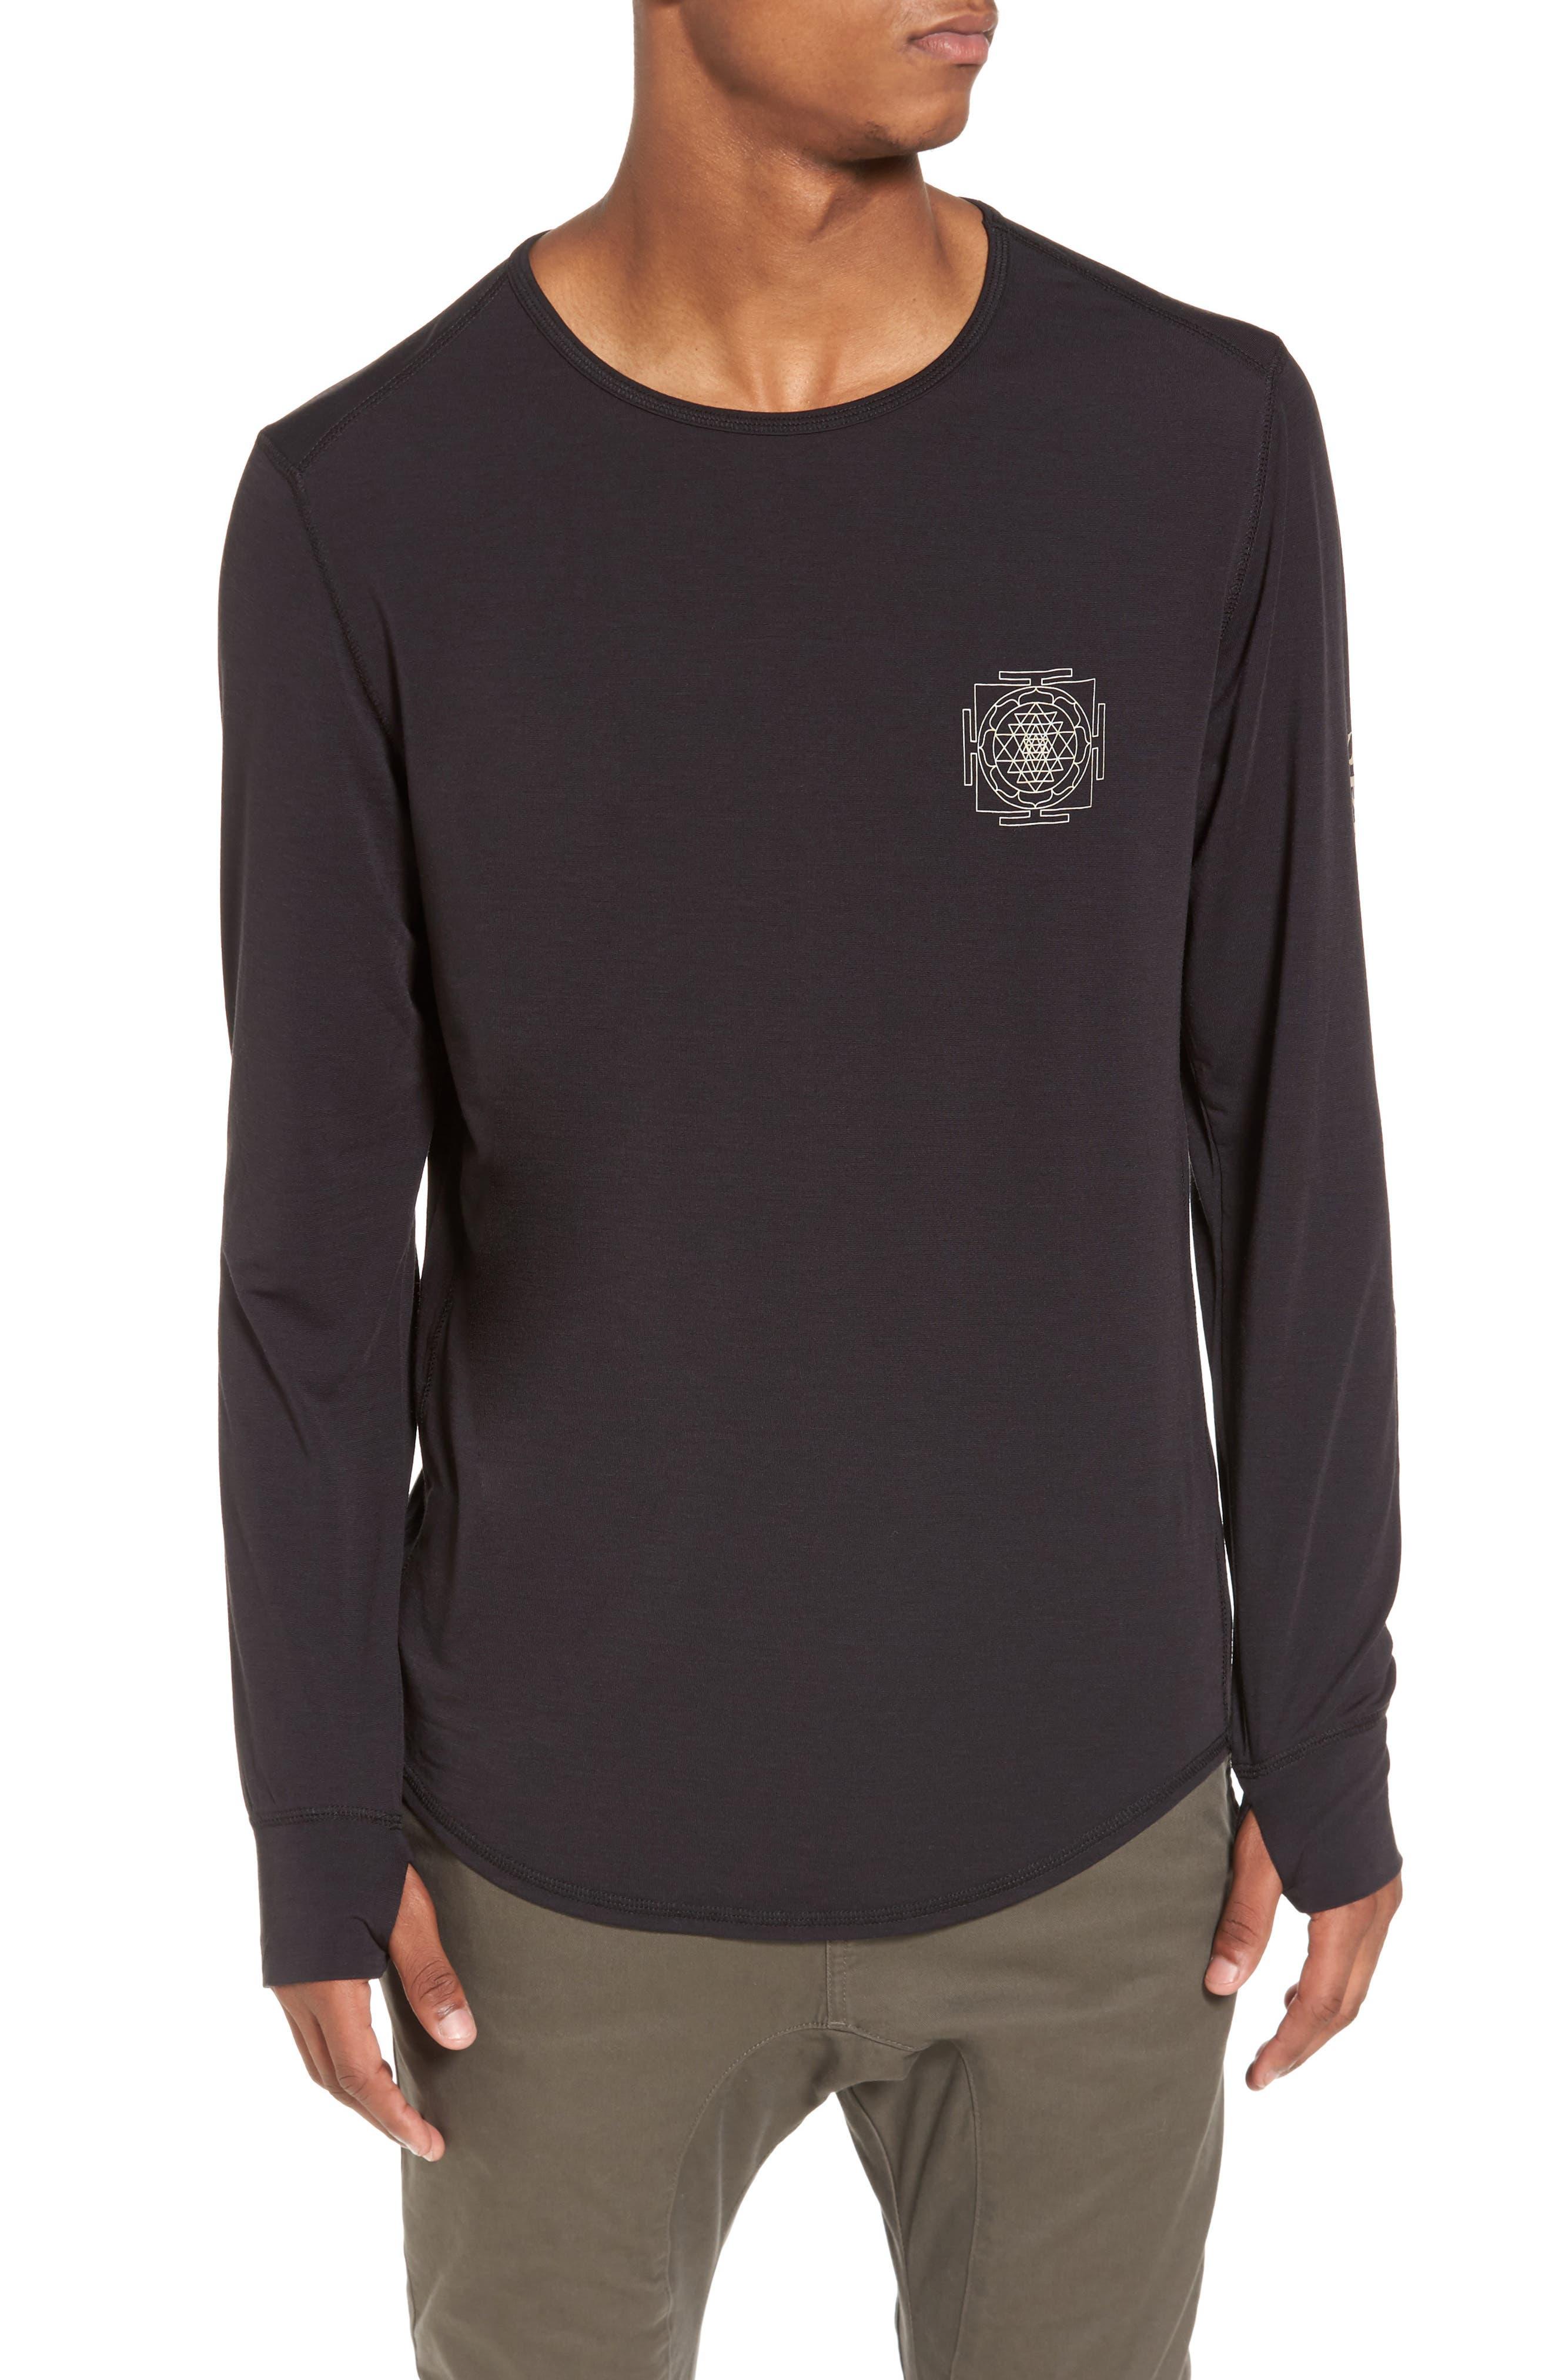 Yantra Wave T-Shirt,                             Main thumbnail 1, color,                             Black/ Black